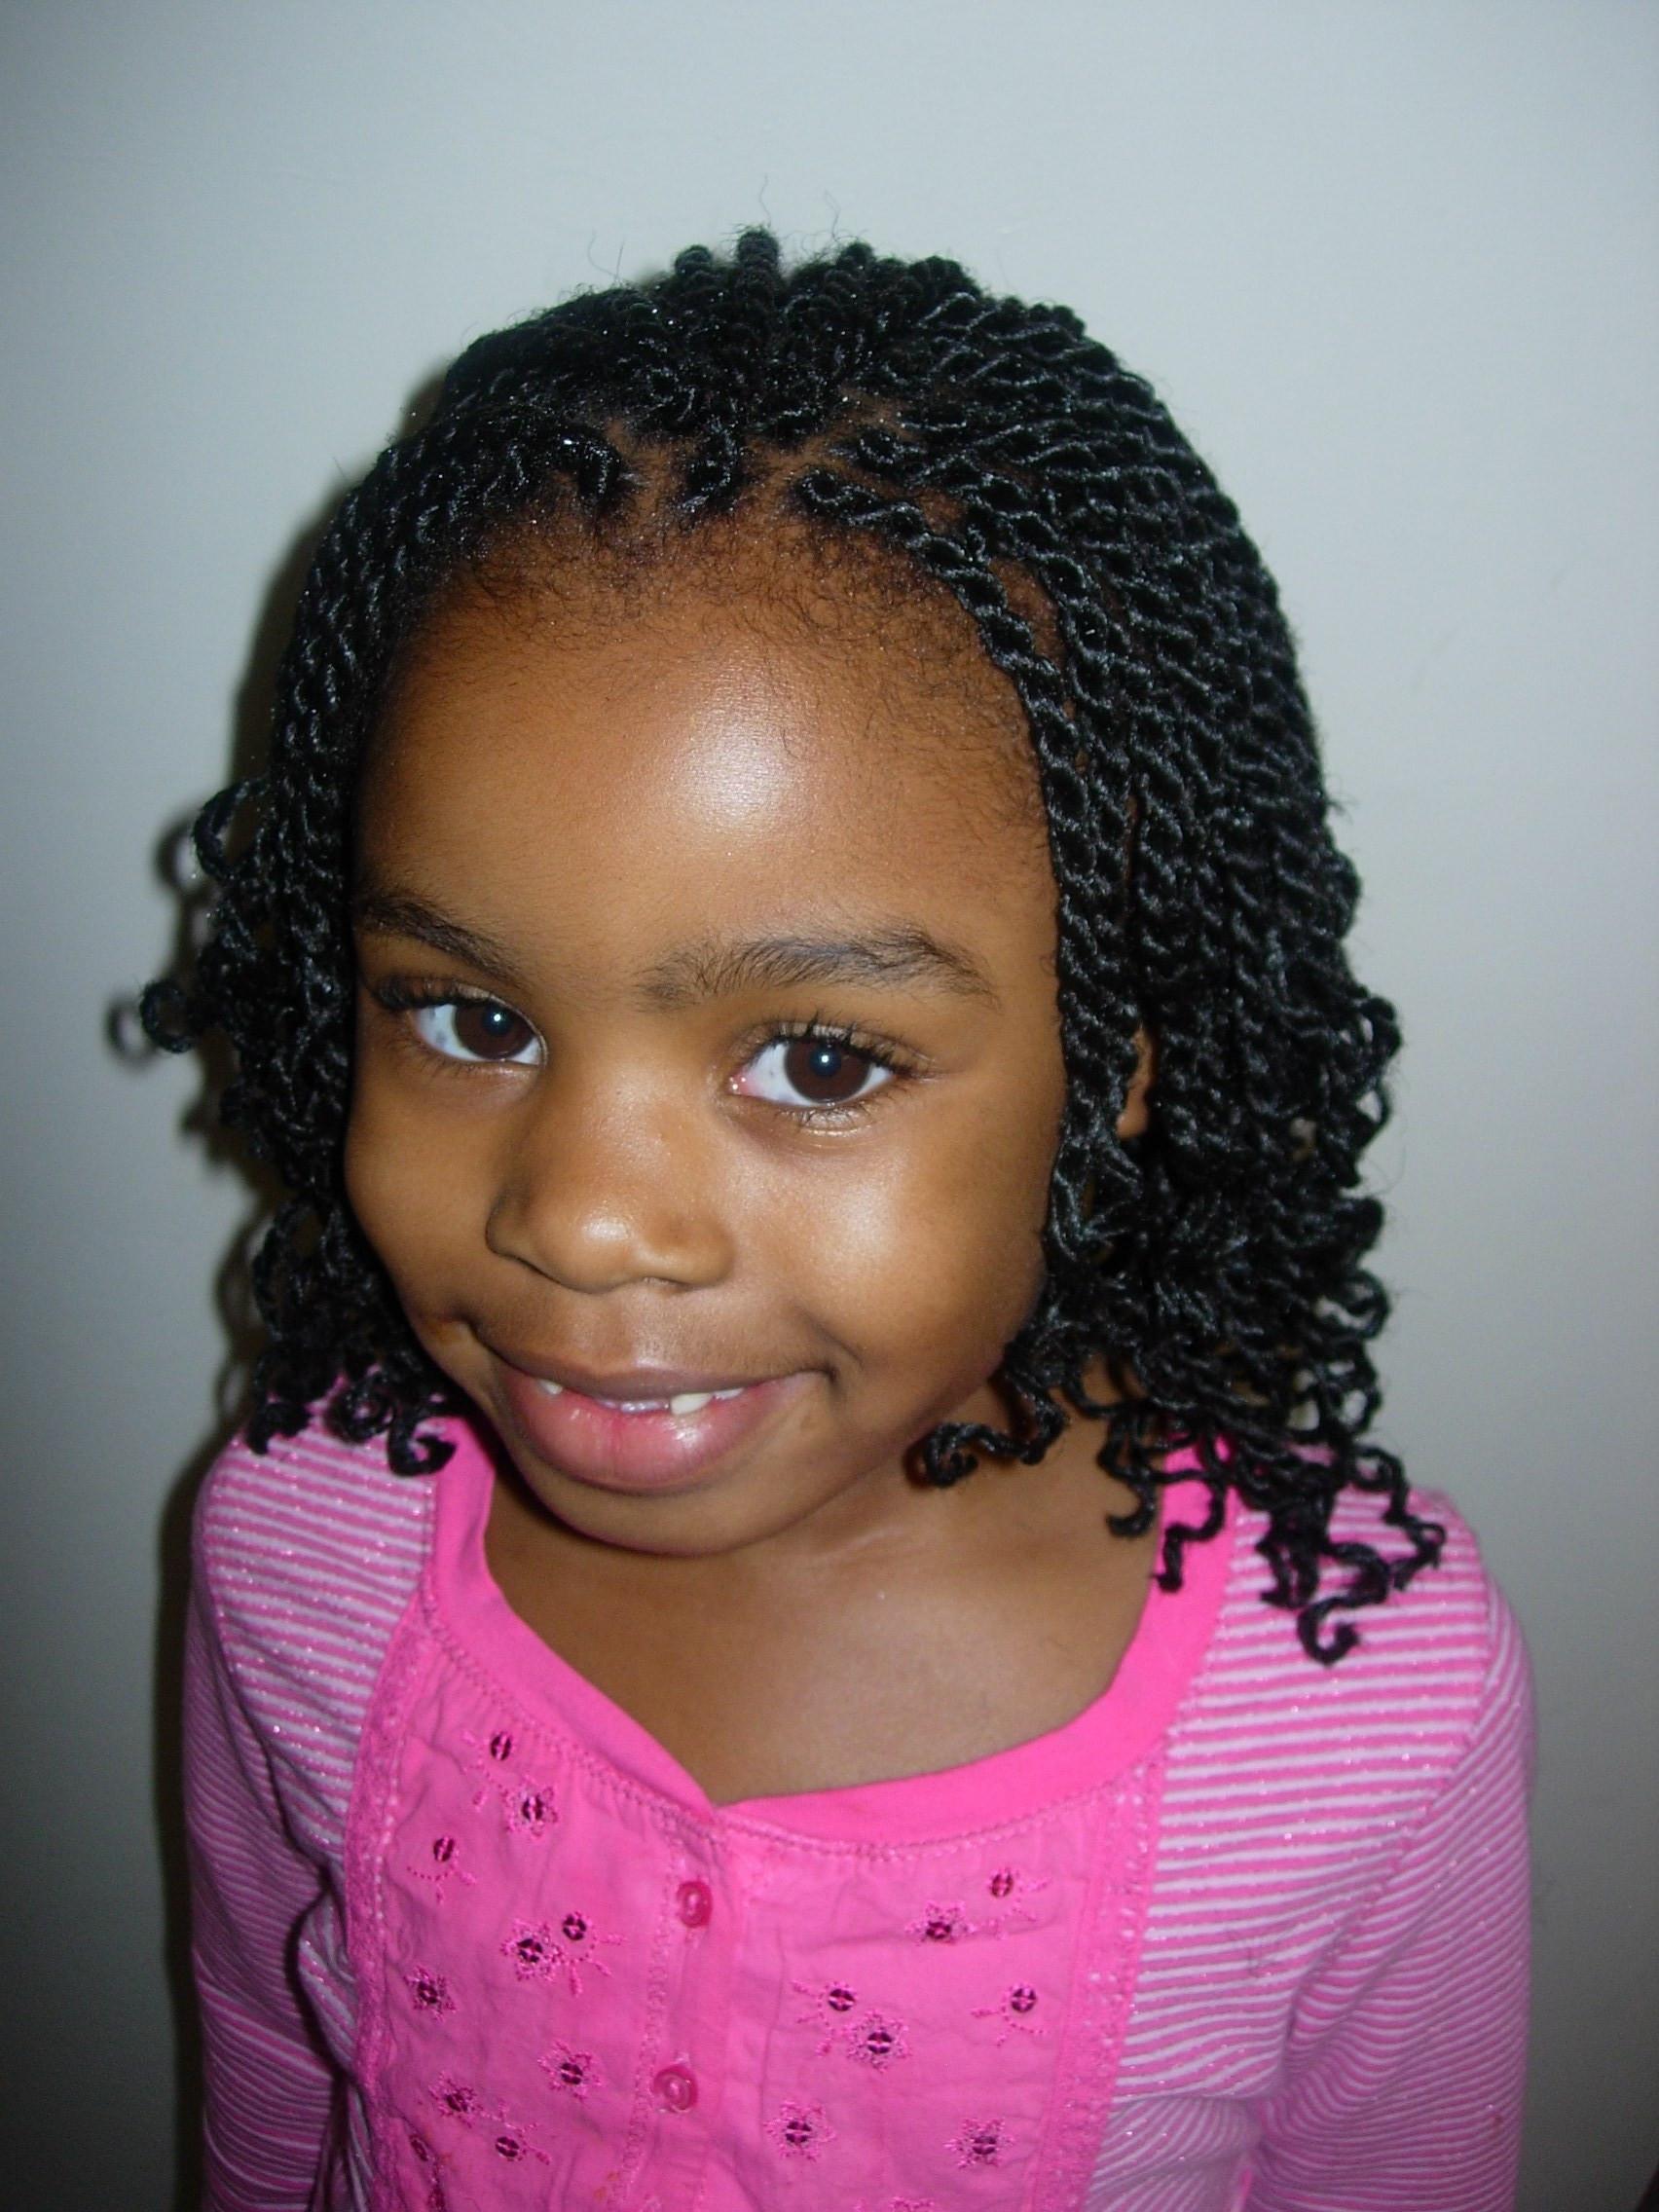 Little Black Girl Hairstyles  9 Best Hairstyles for Black Little Girls